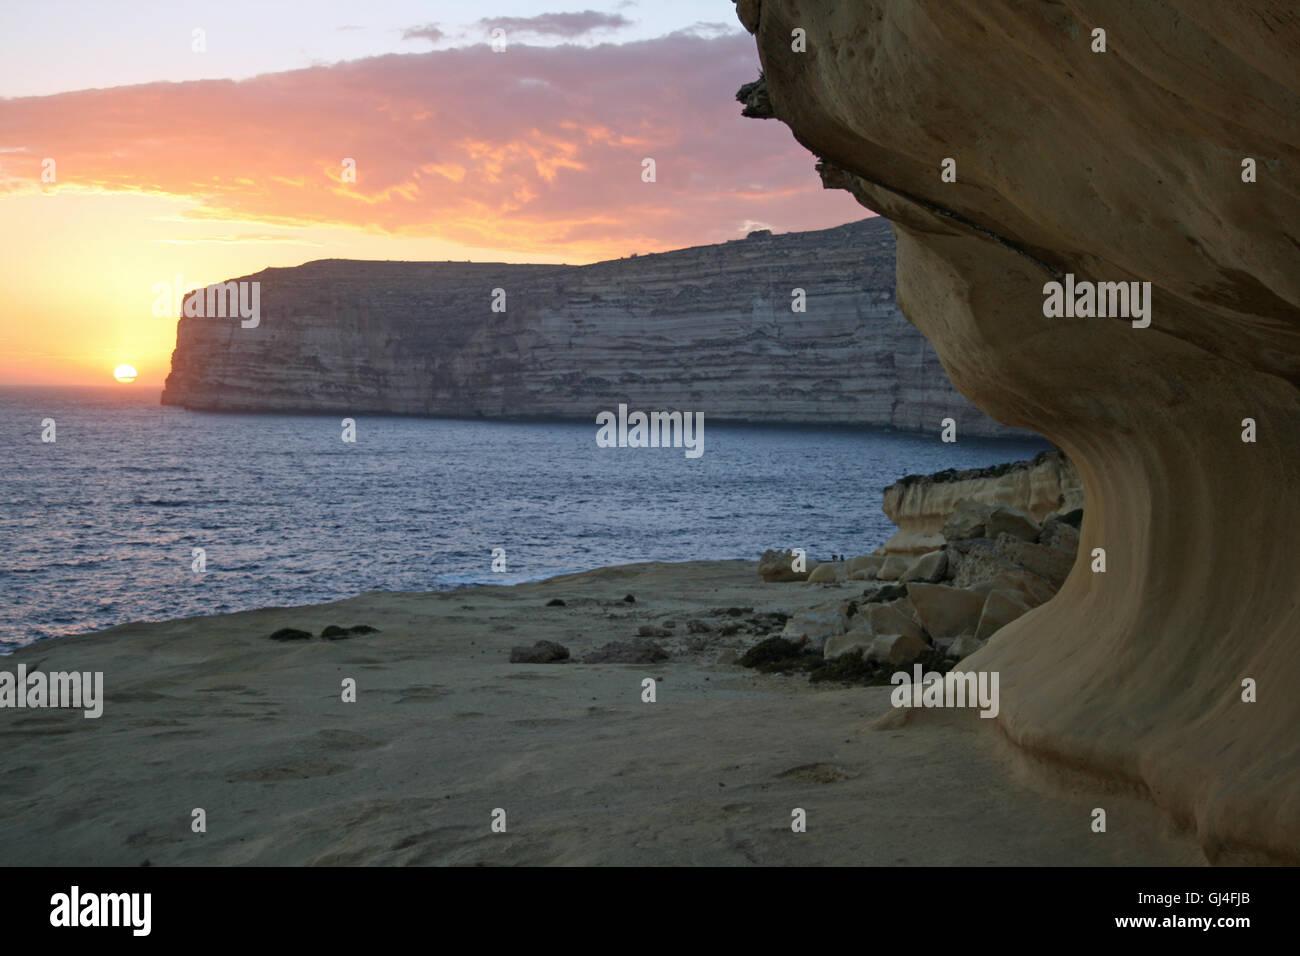 Xlendi bay at sunset - Stock Image